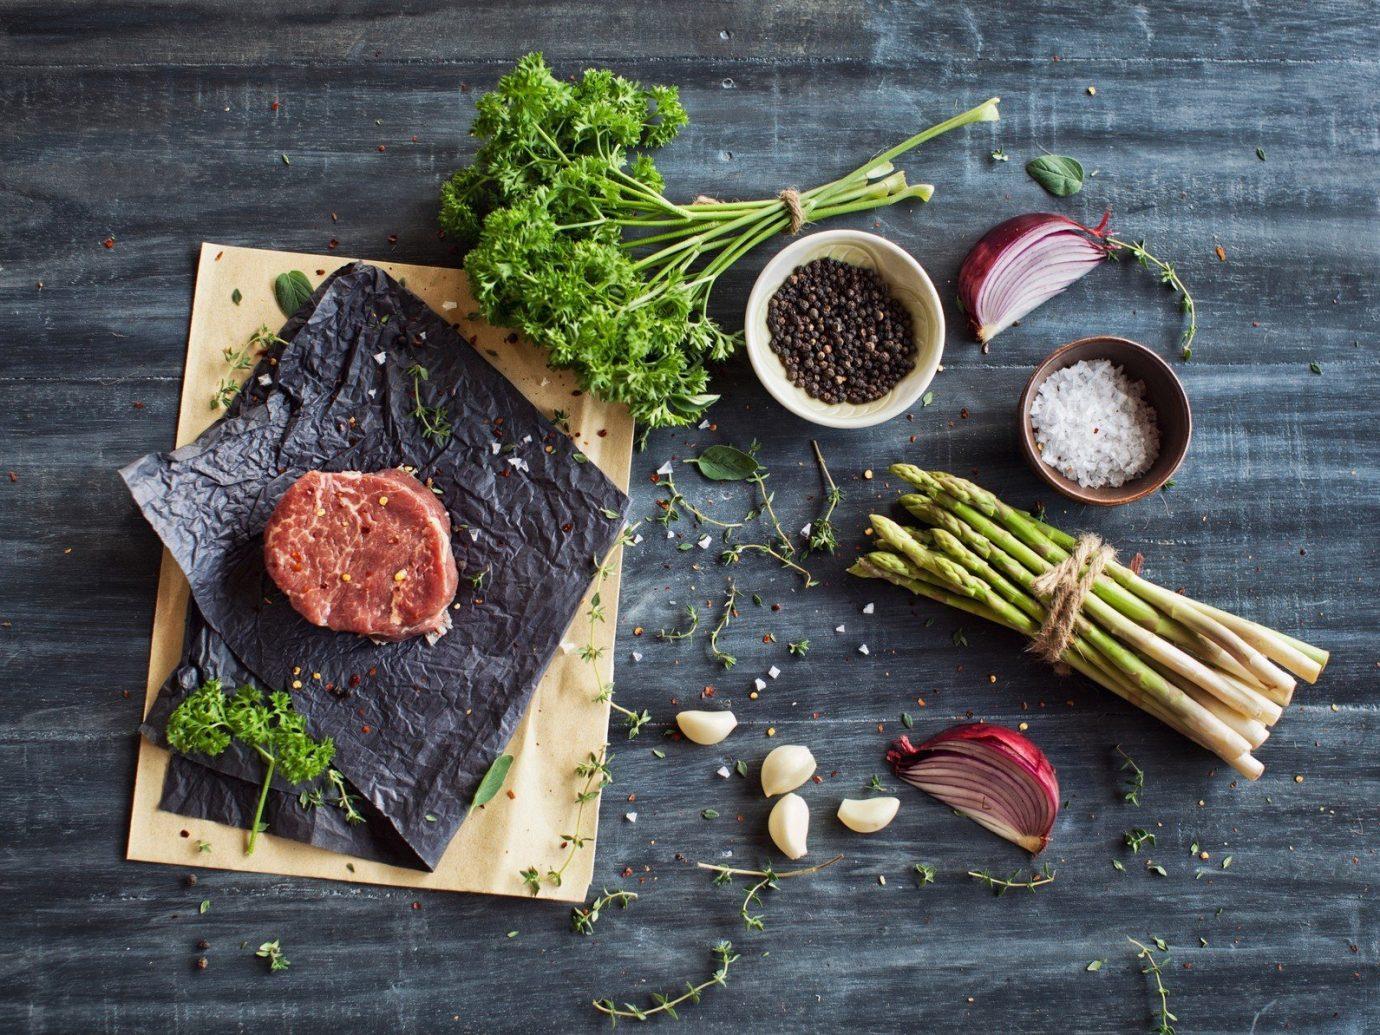 Food + Drink food produce leaf wooden vegetable herb